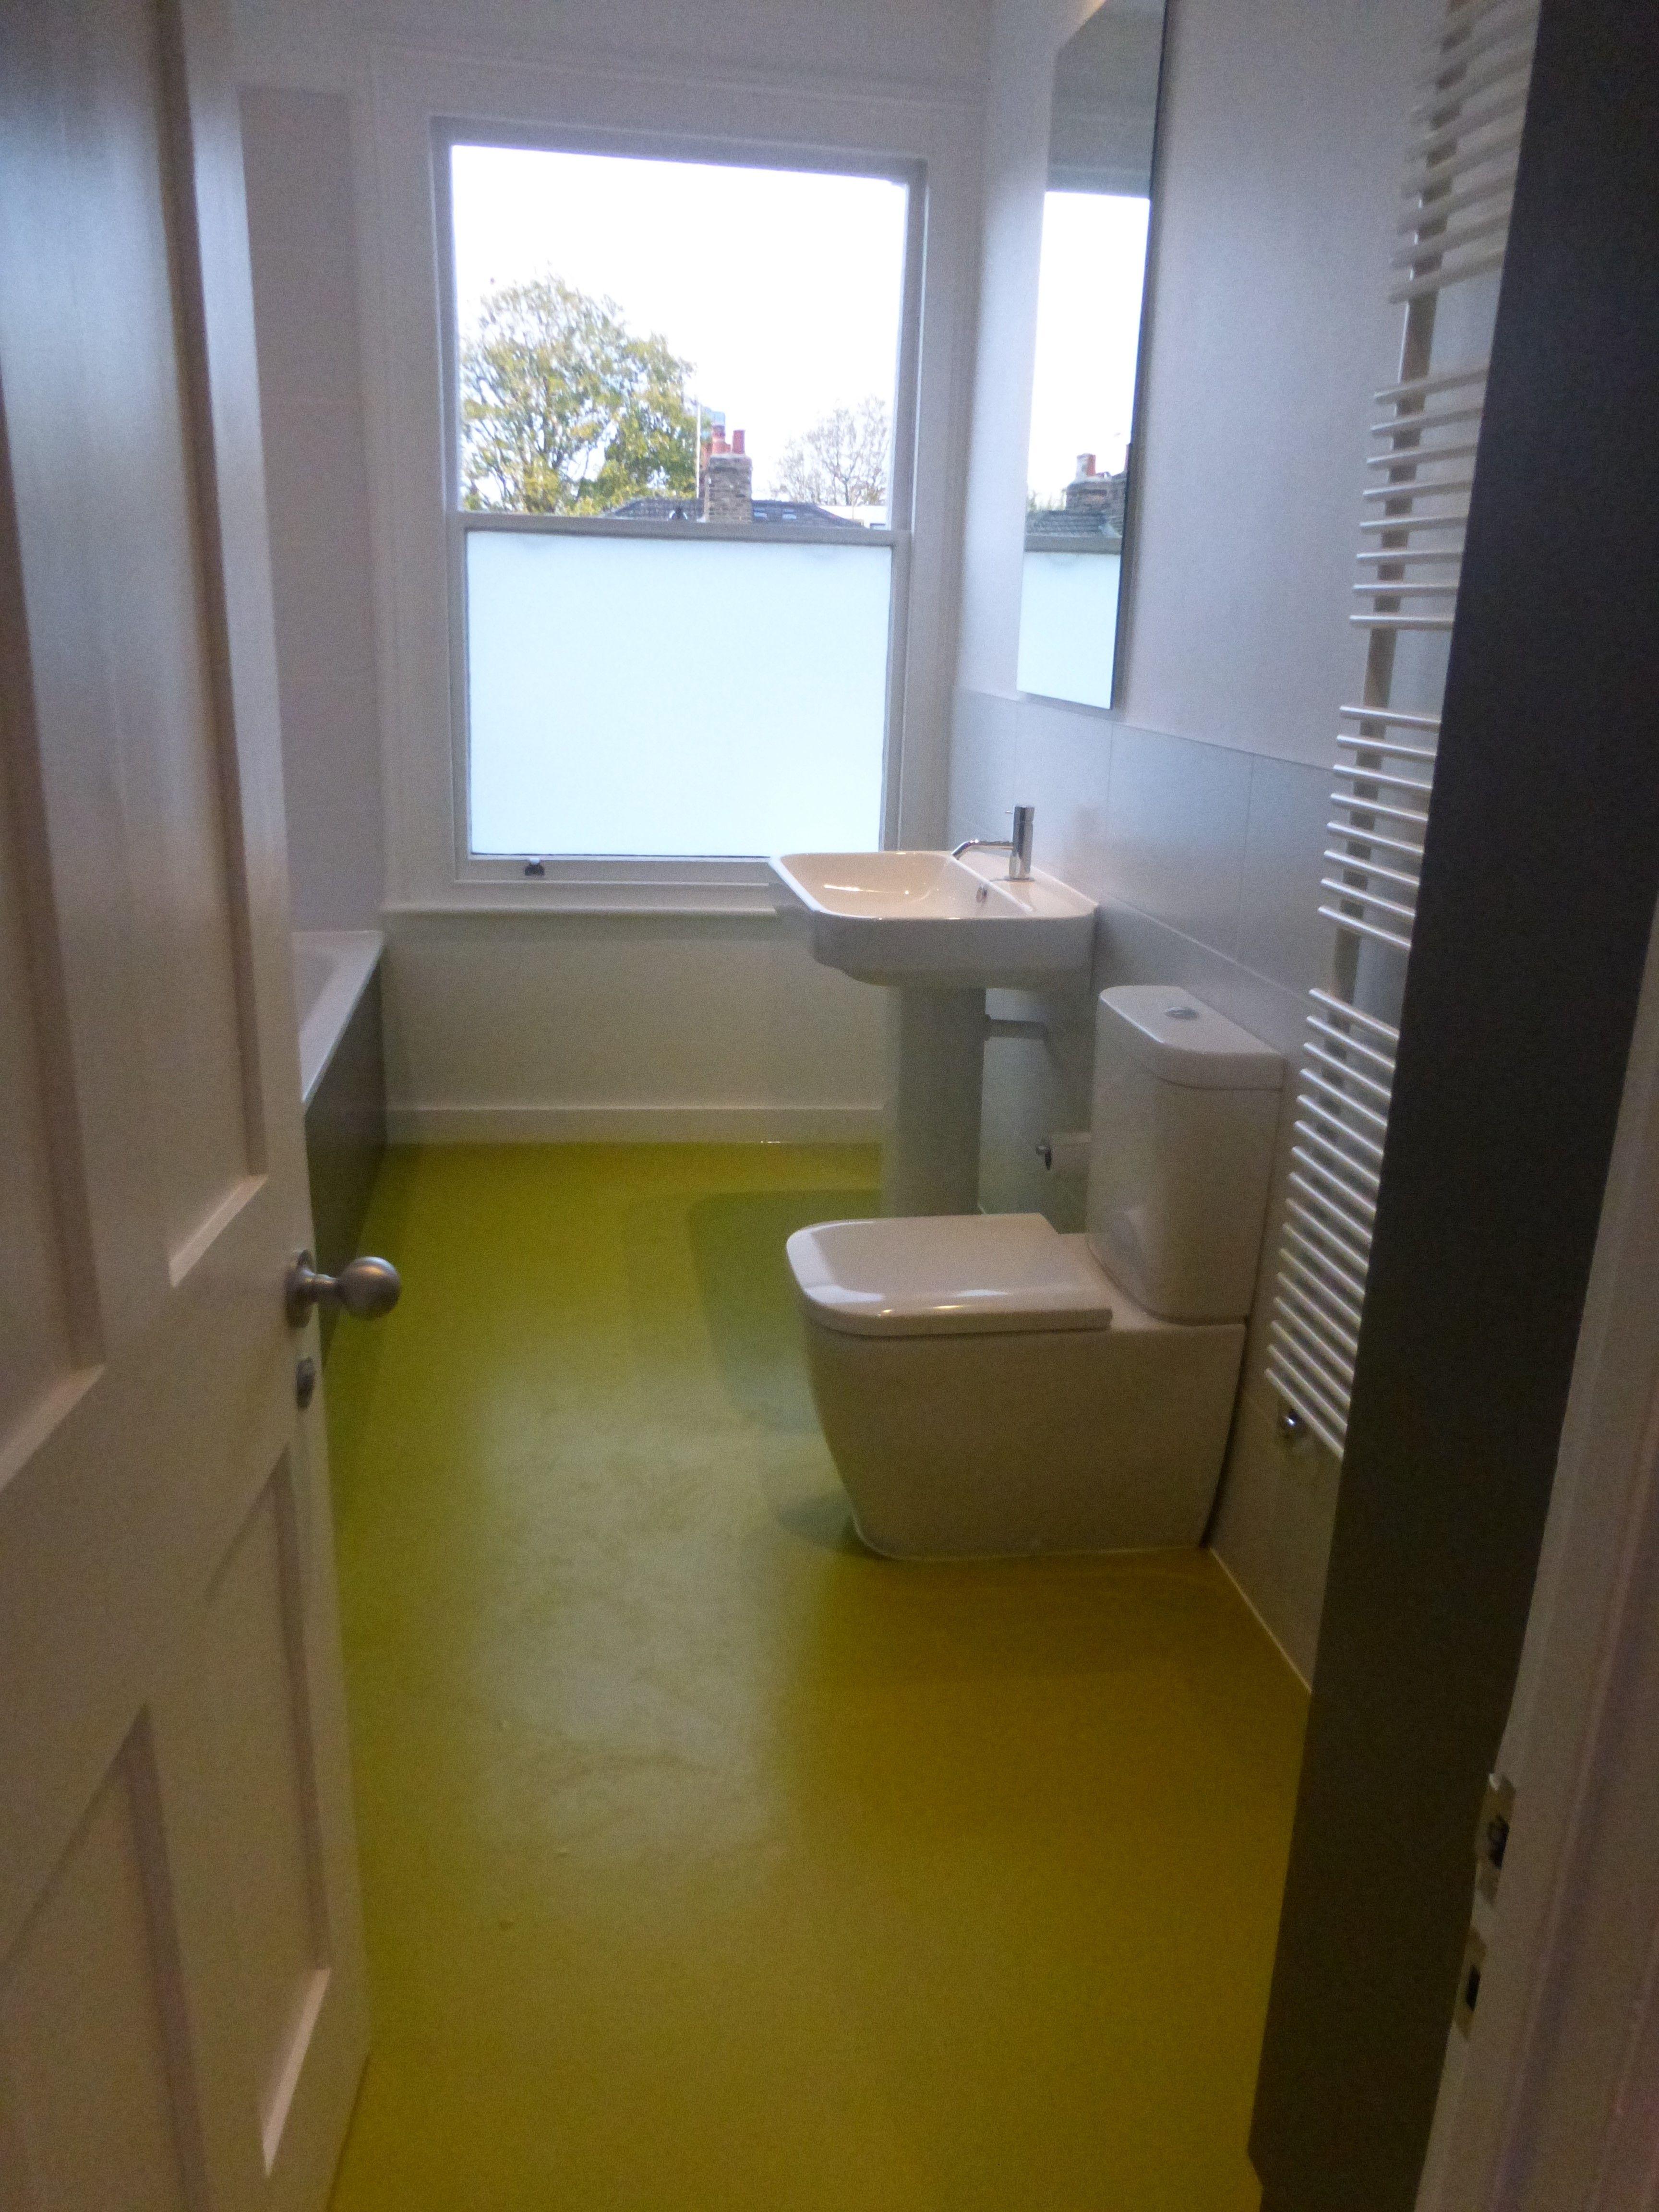 Butterfield Green Bathroom Rubber Flooring Bright Interior Deign